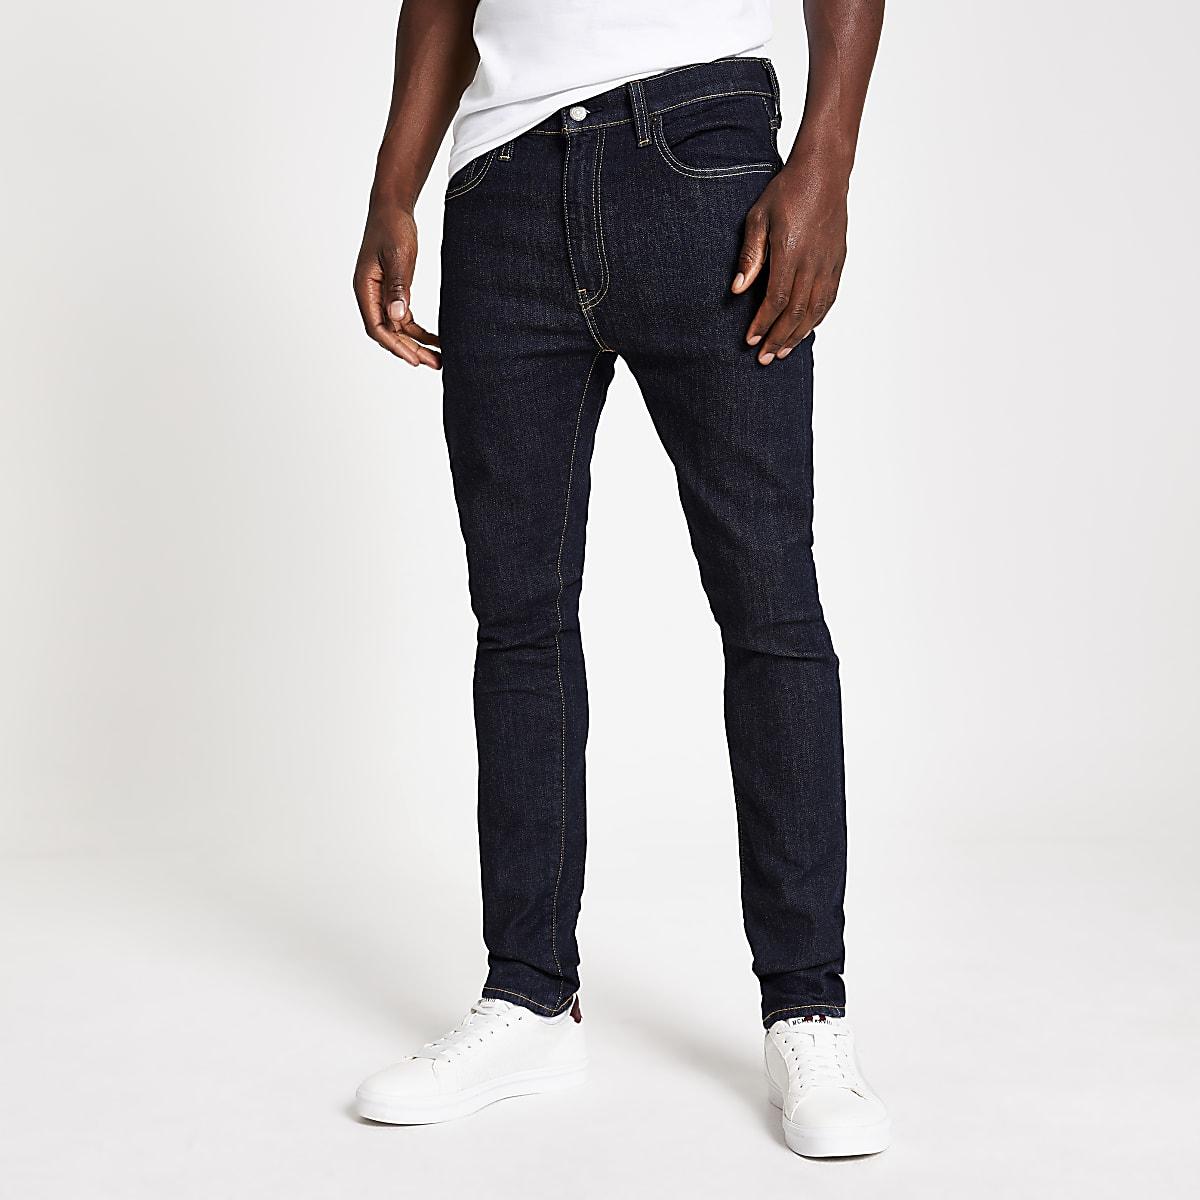 Levi's dark blue 519 extreme skinny jeans